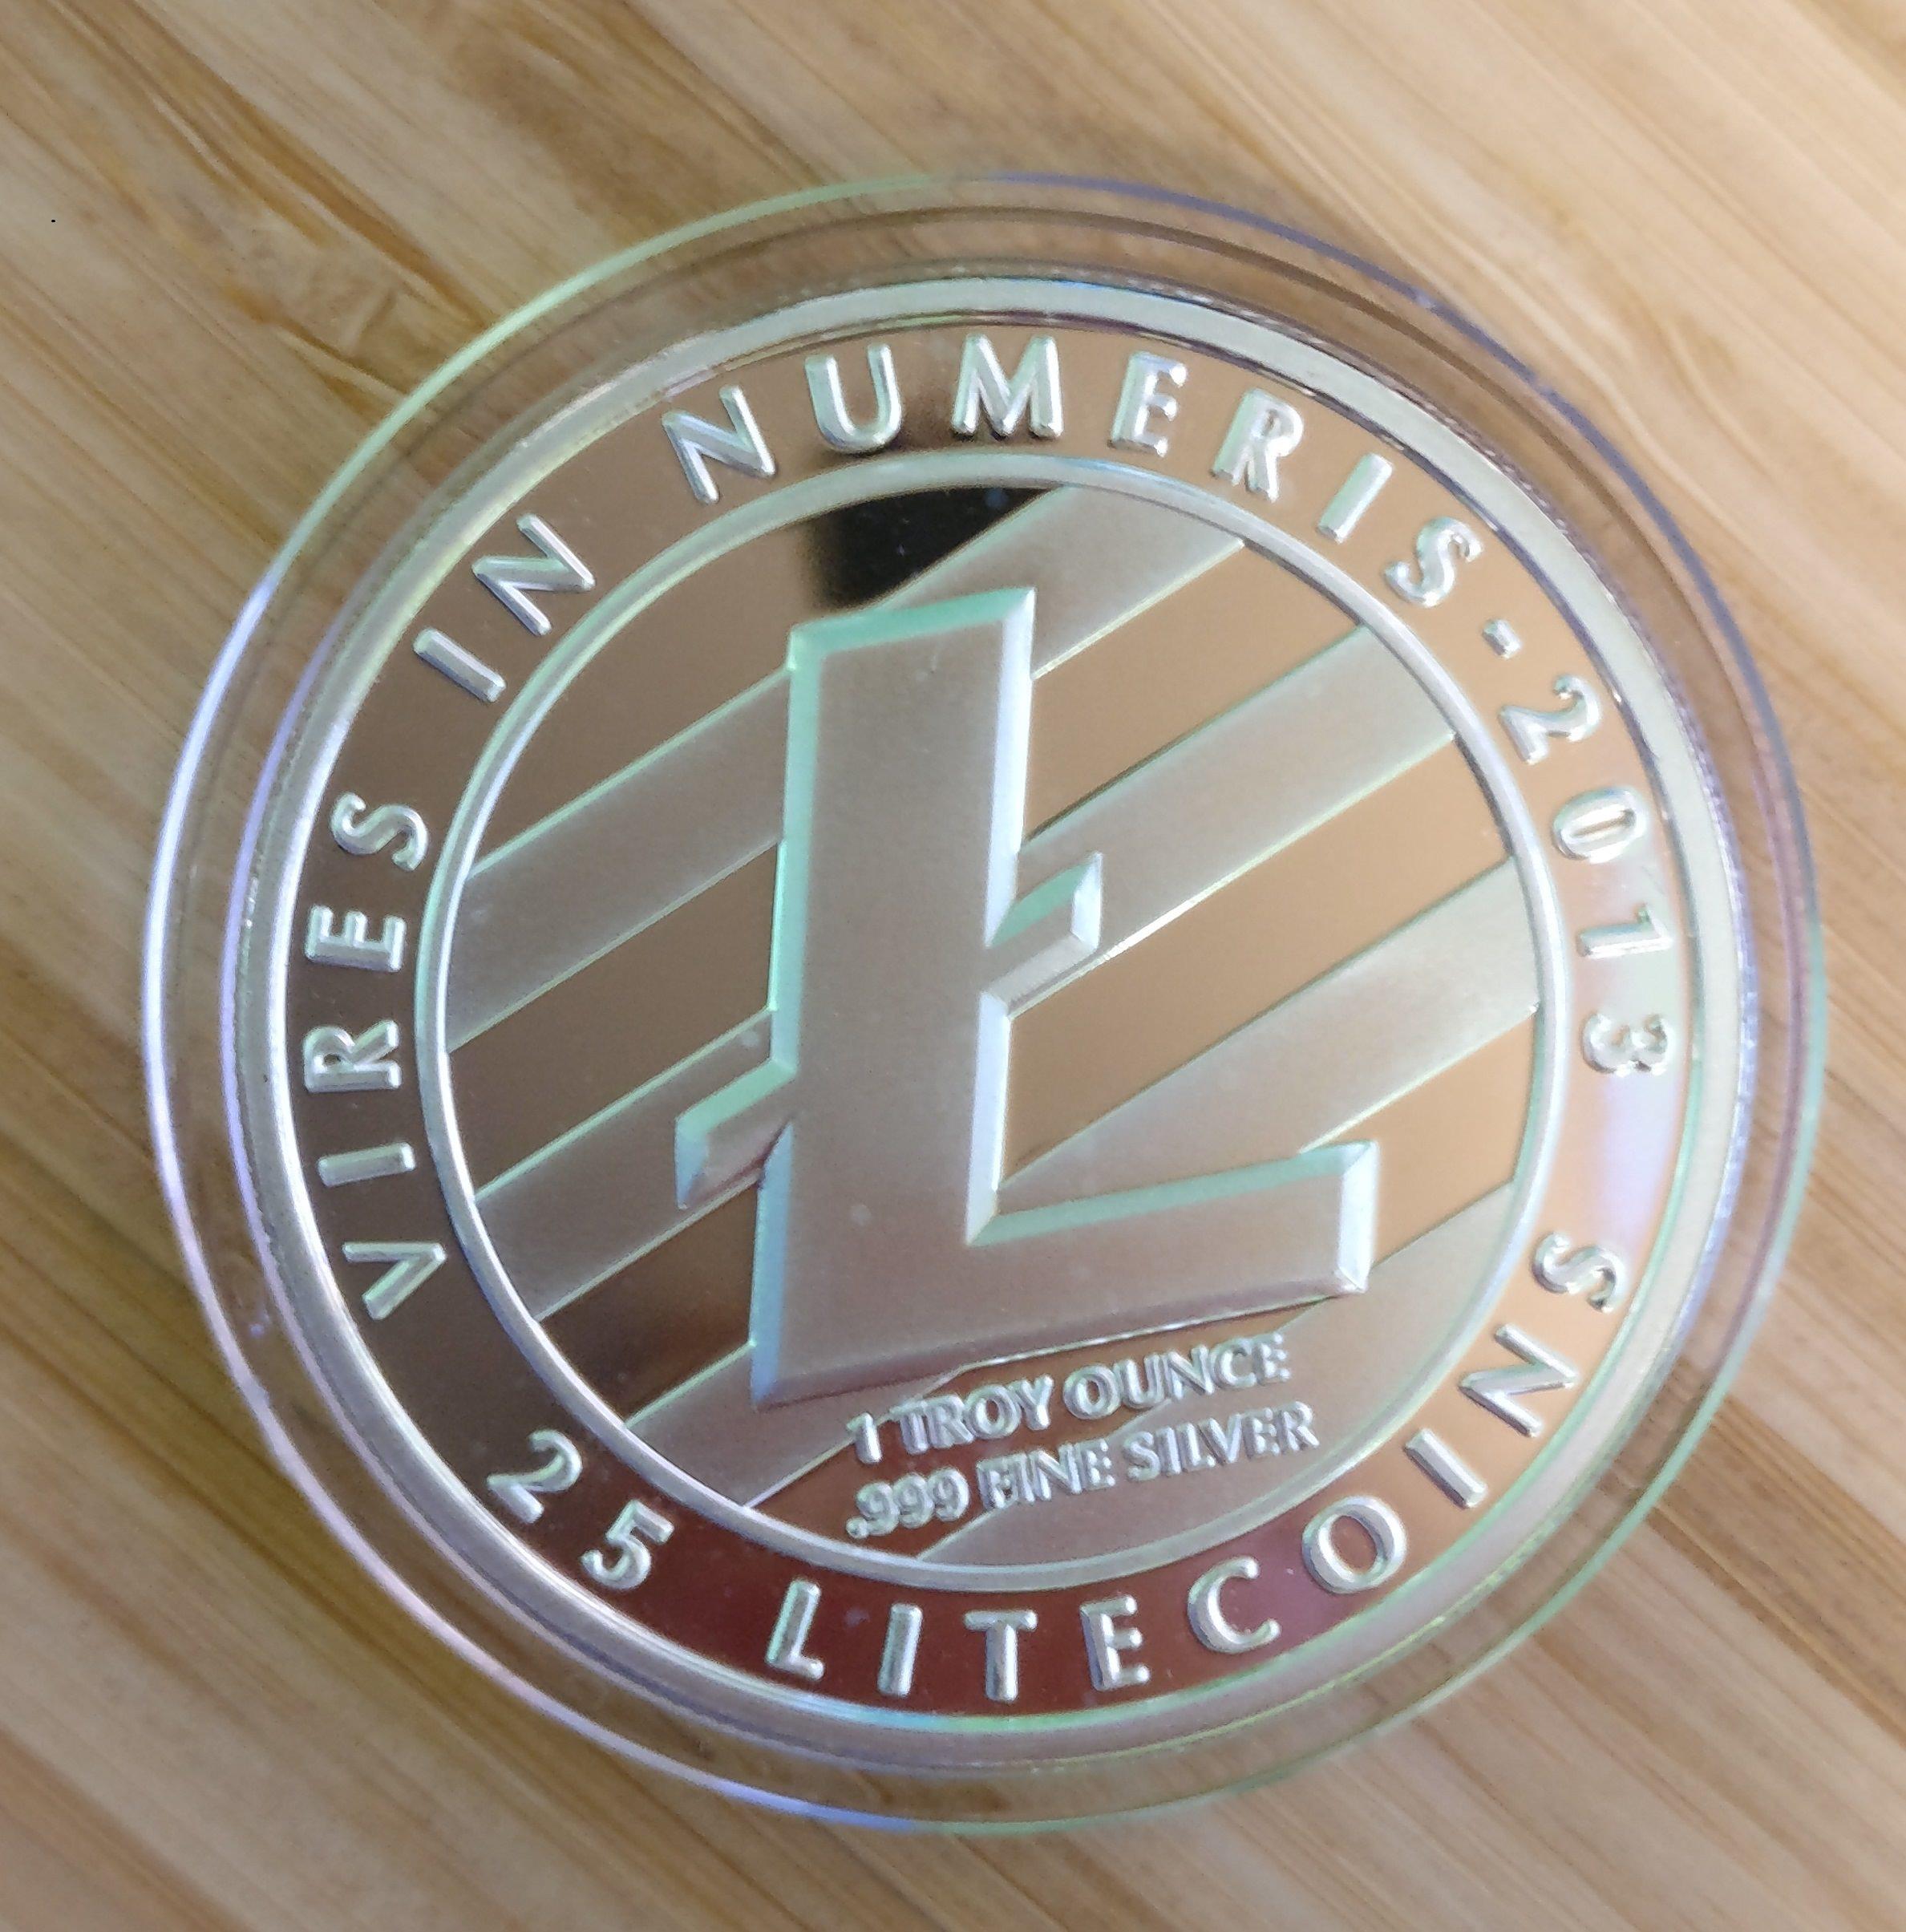 Litecoin Miner 4 Terrified Premium